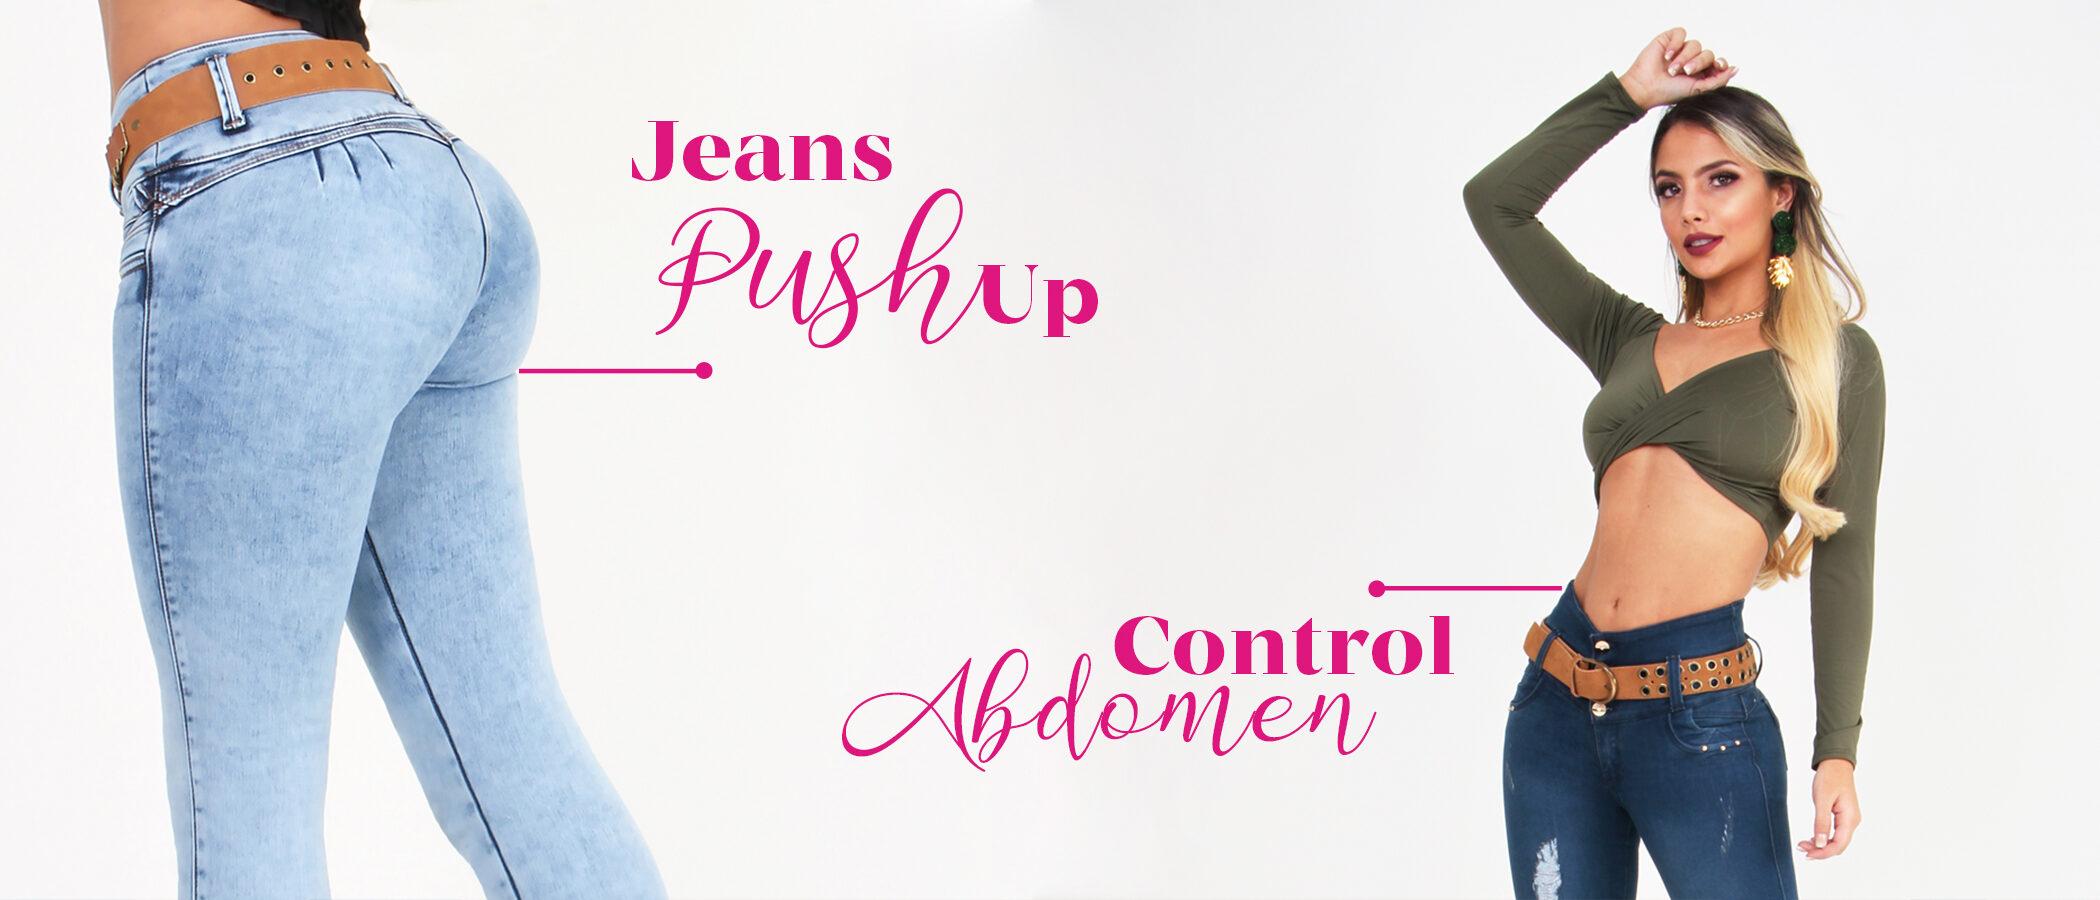 Jeans De Hombre Colombianos Waoo Jeans